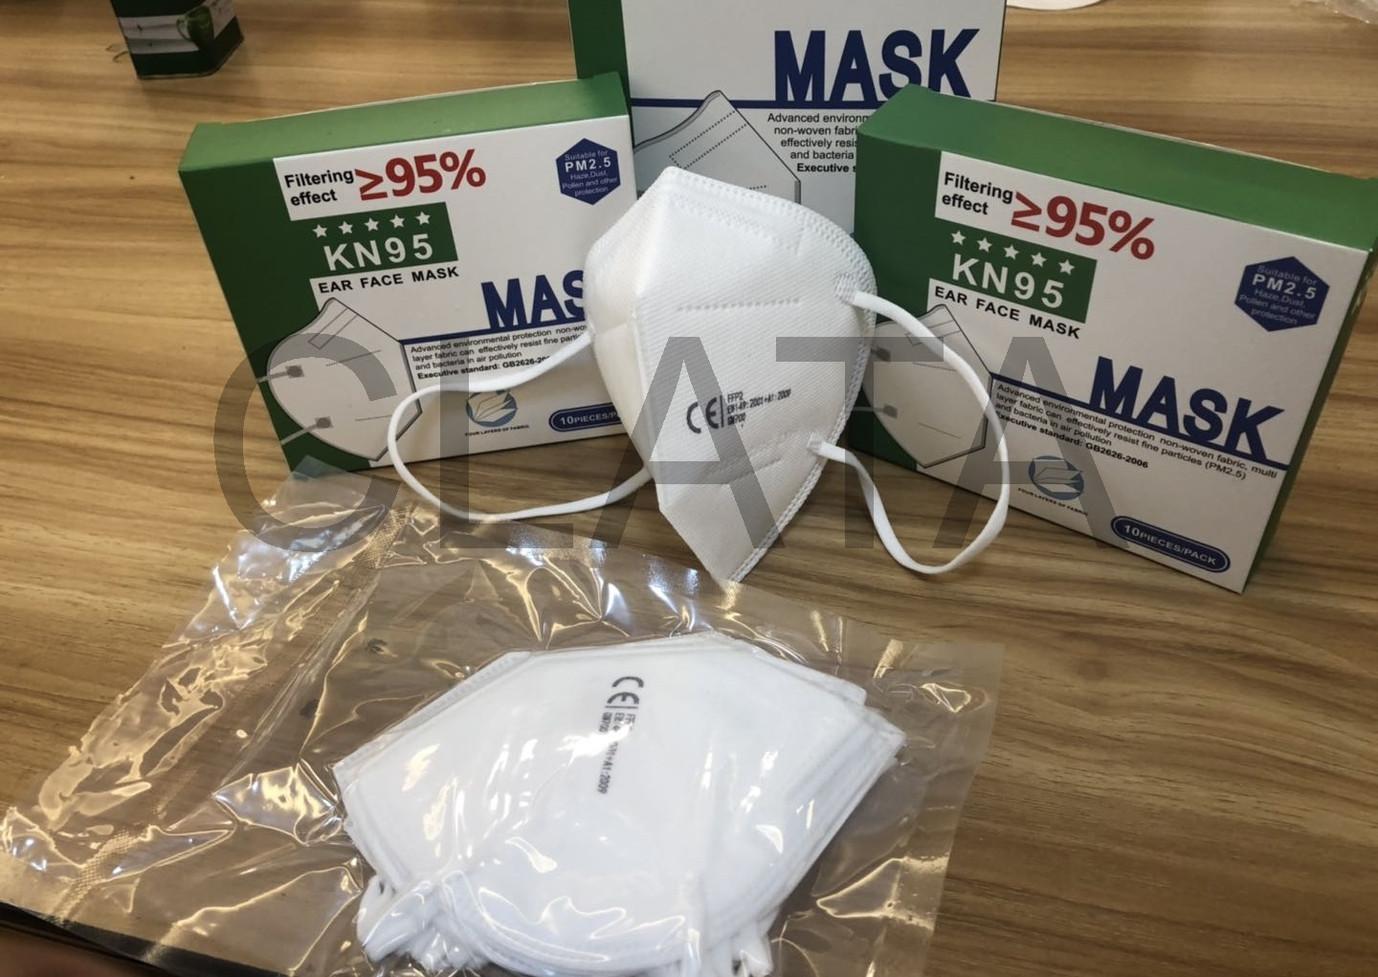 FFp2 / N95 Masks